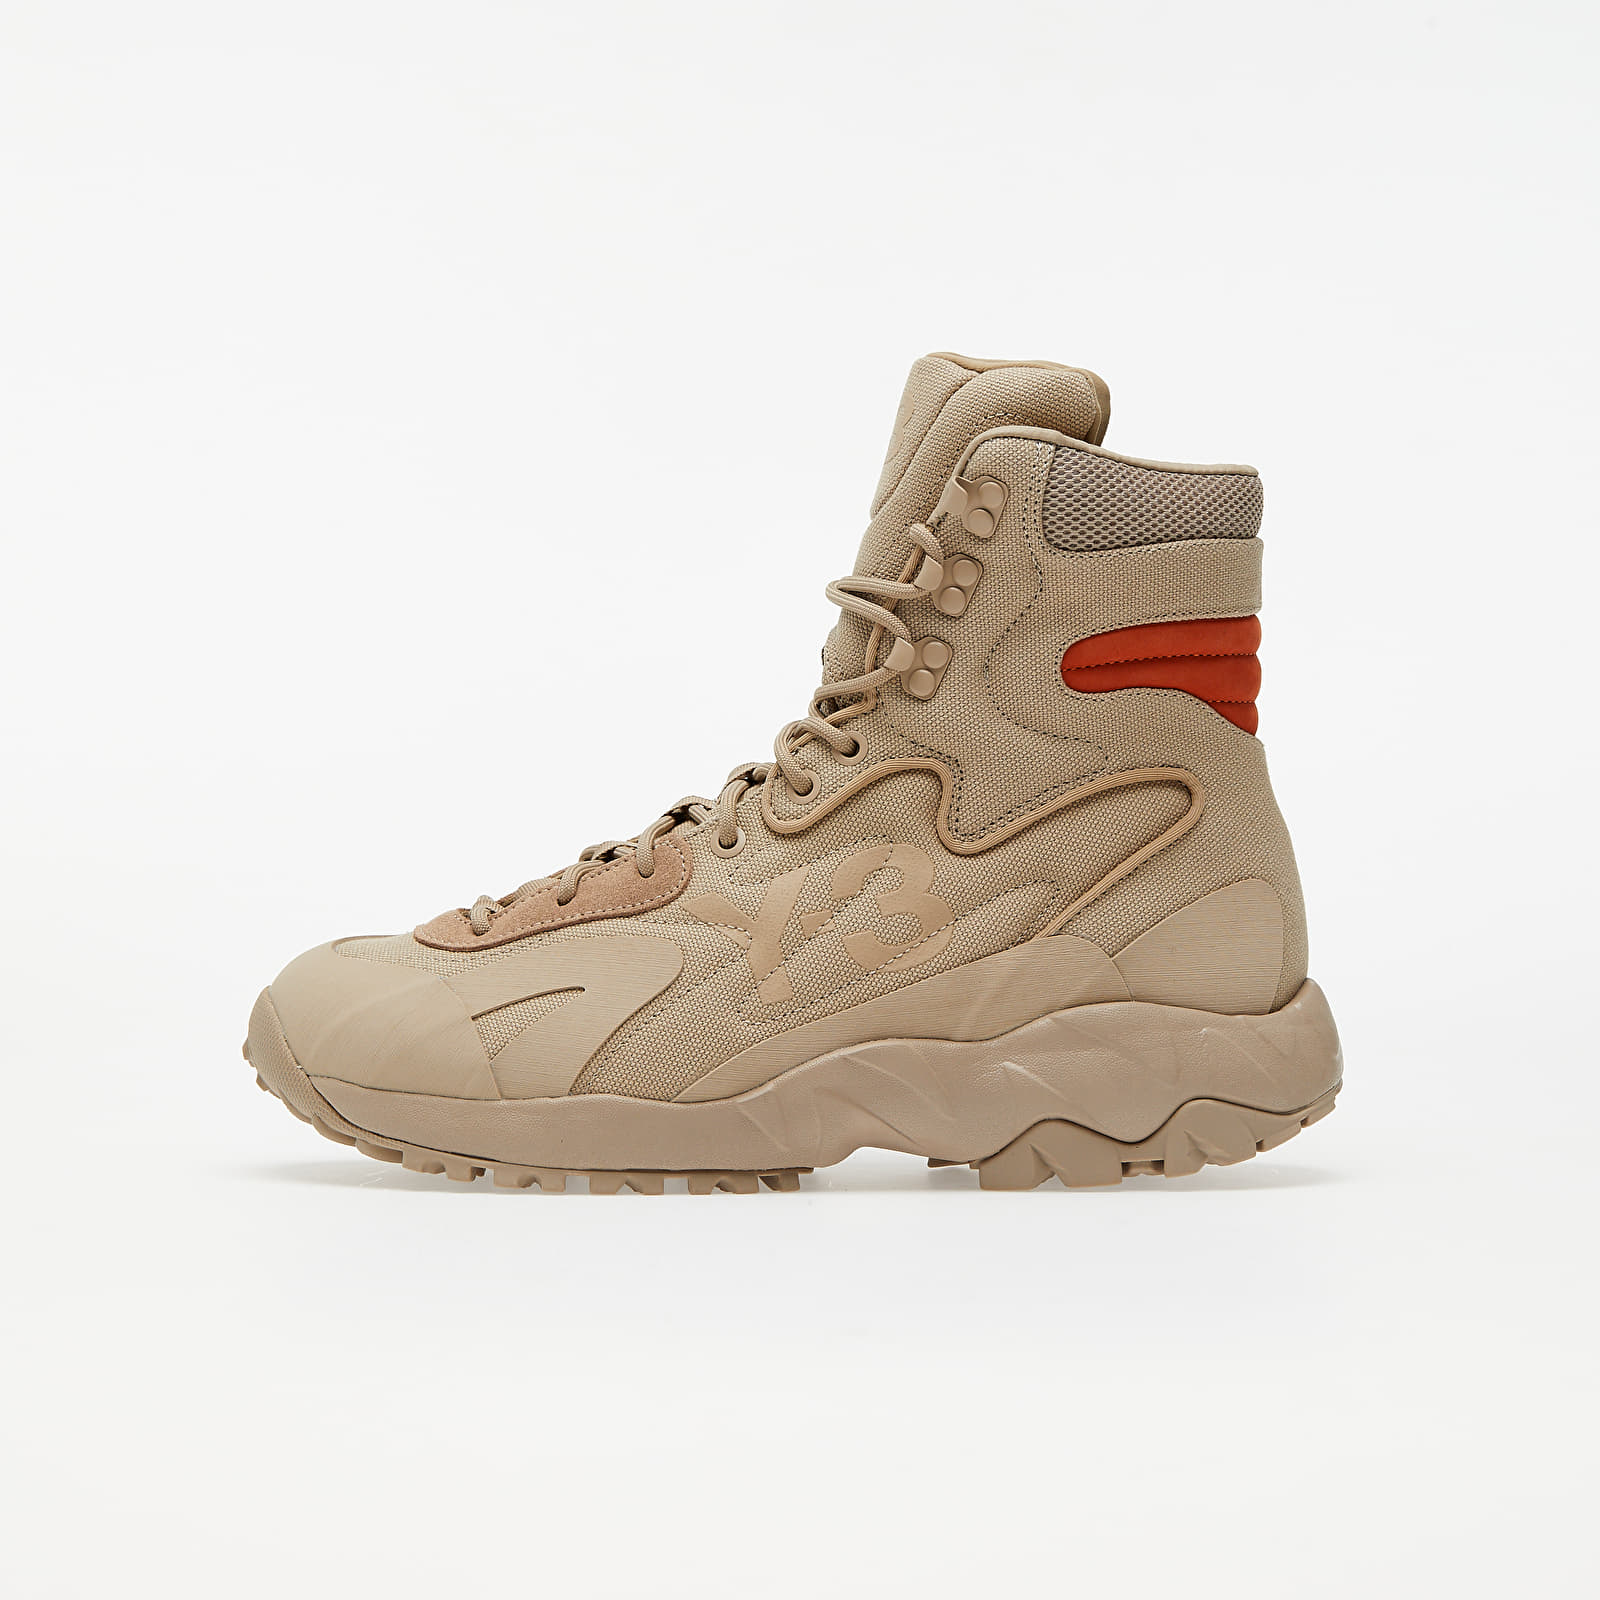 Chaussures et baskets homme Y-3 Notoma Trace Khaki/ Trace Khaki/ Fox Orange